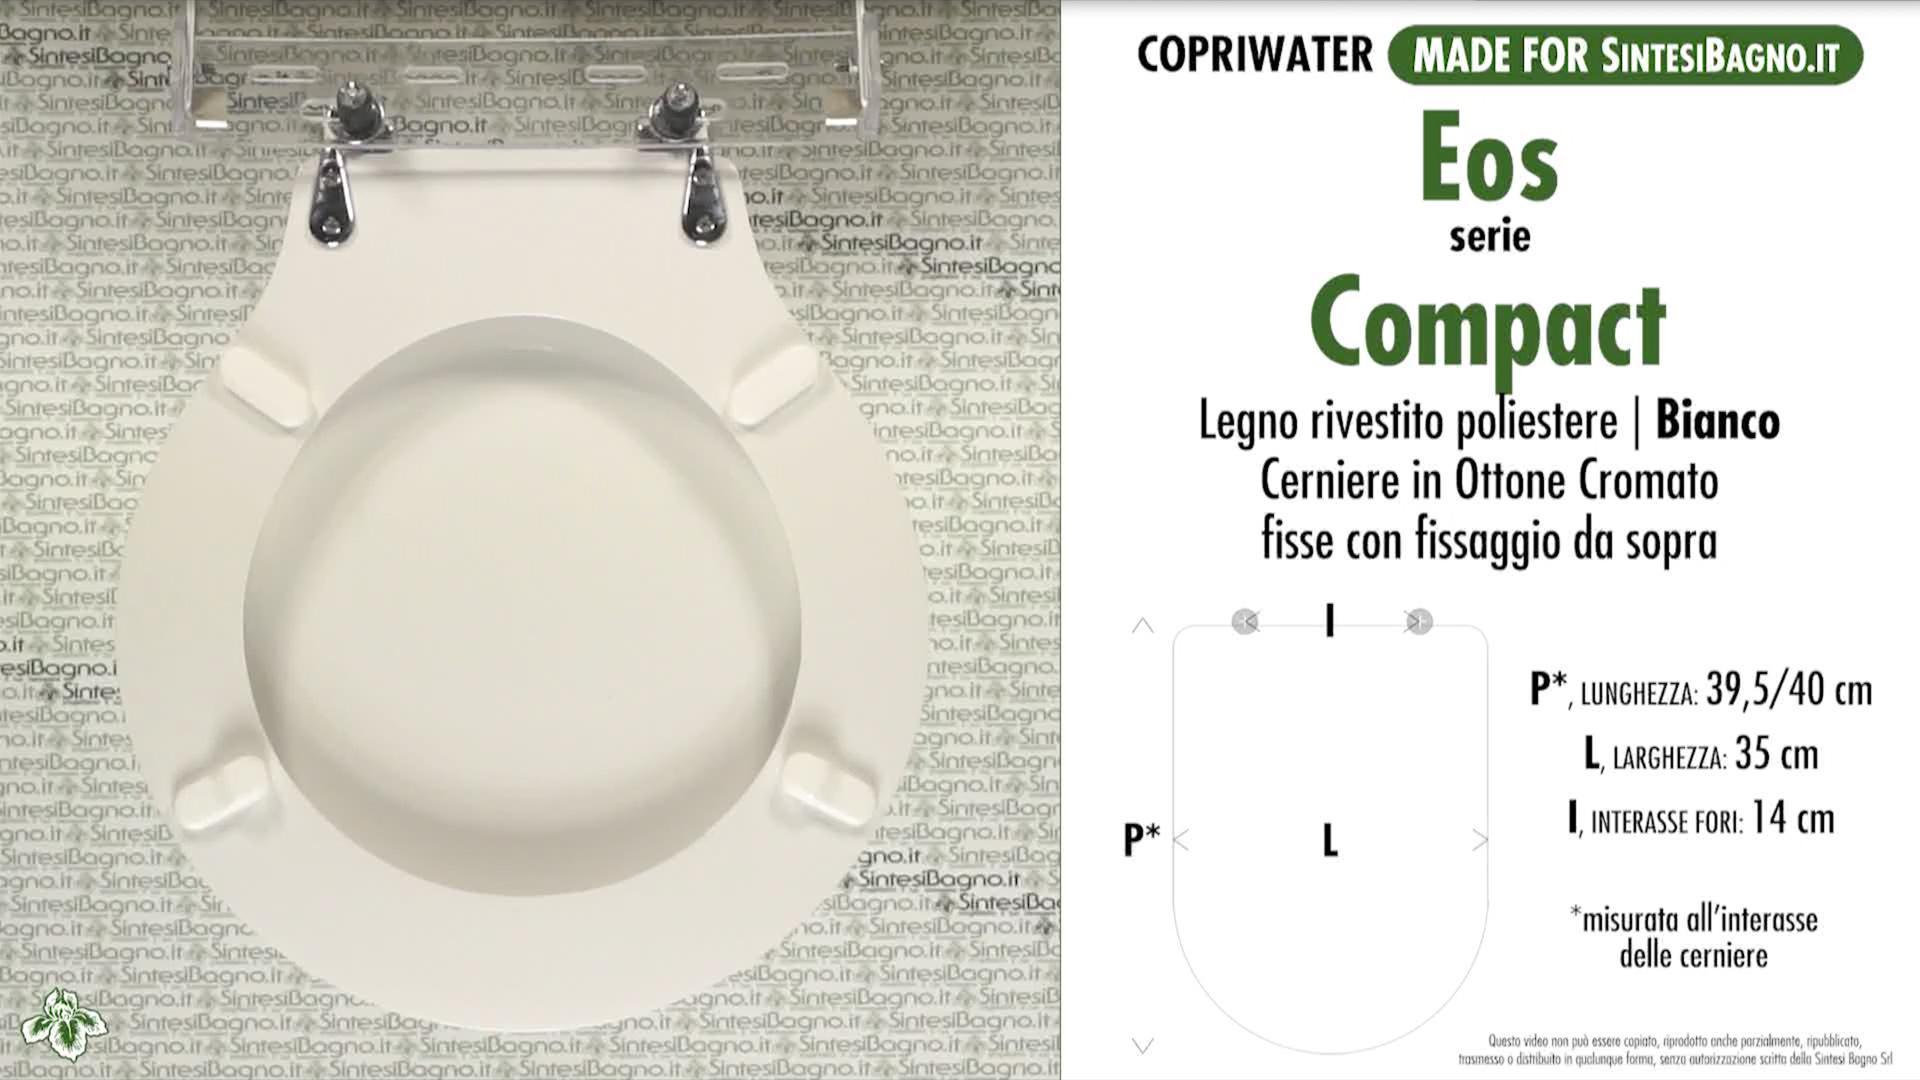 Schede tecniche Eos Compact